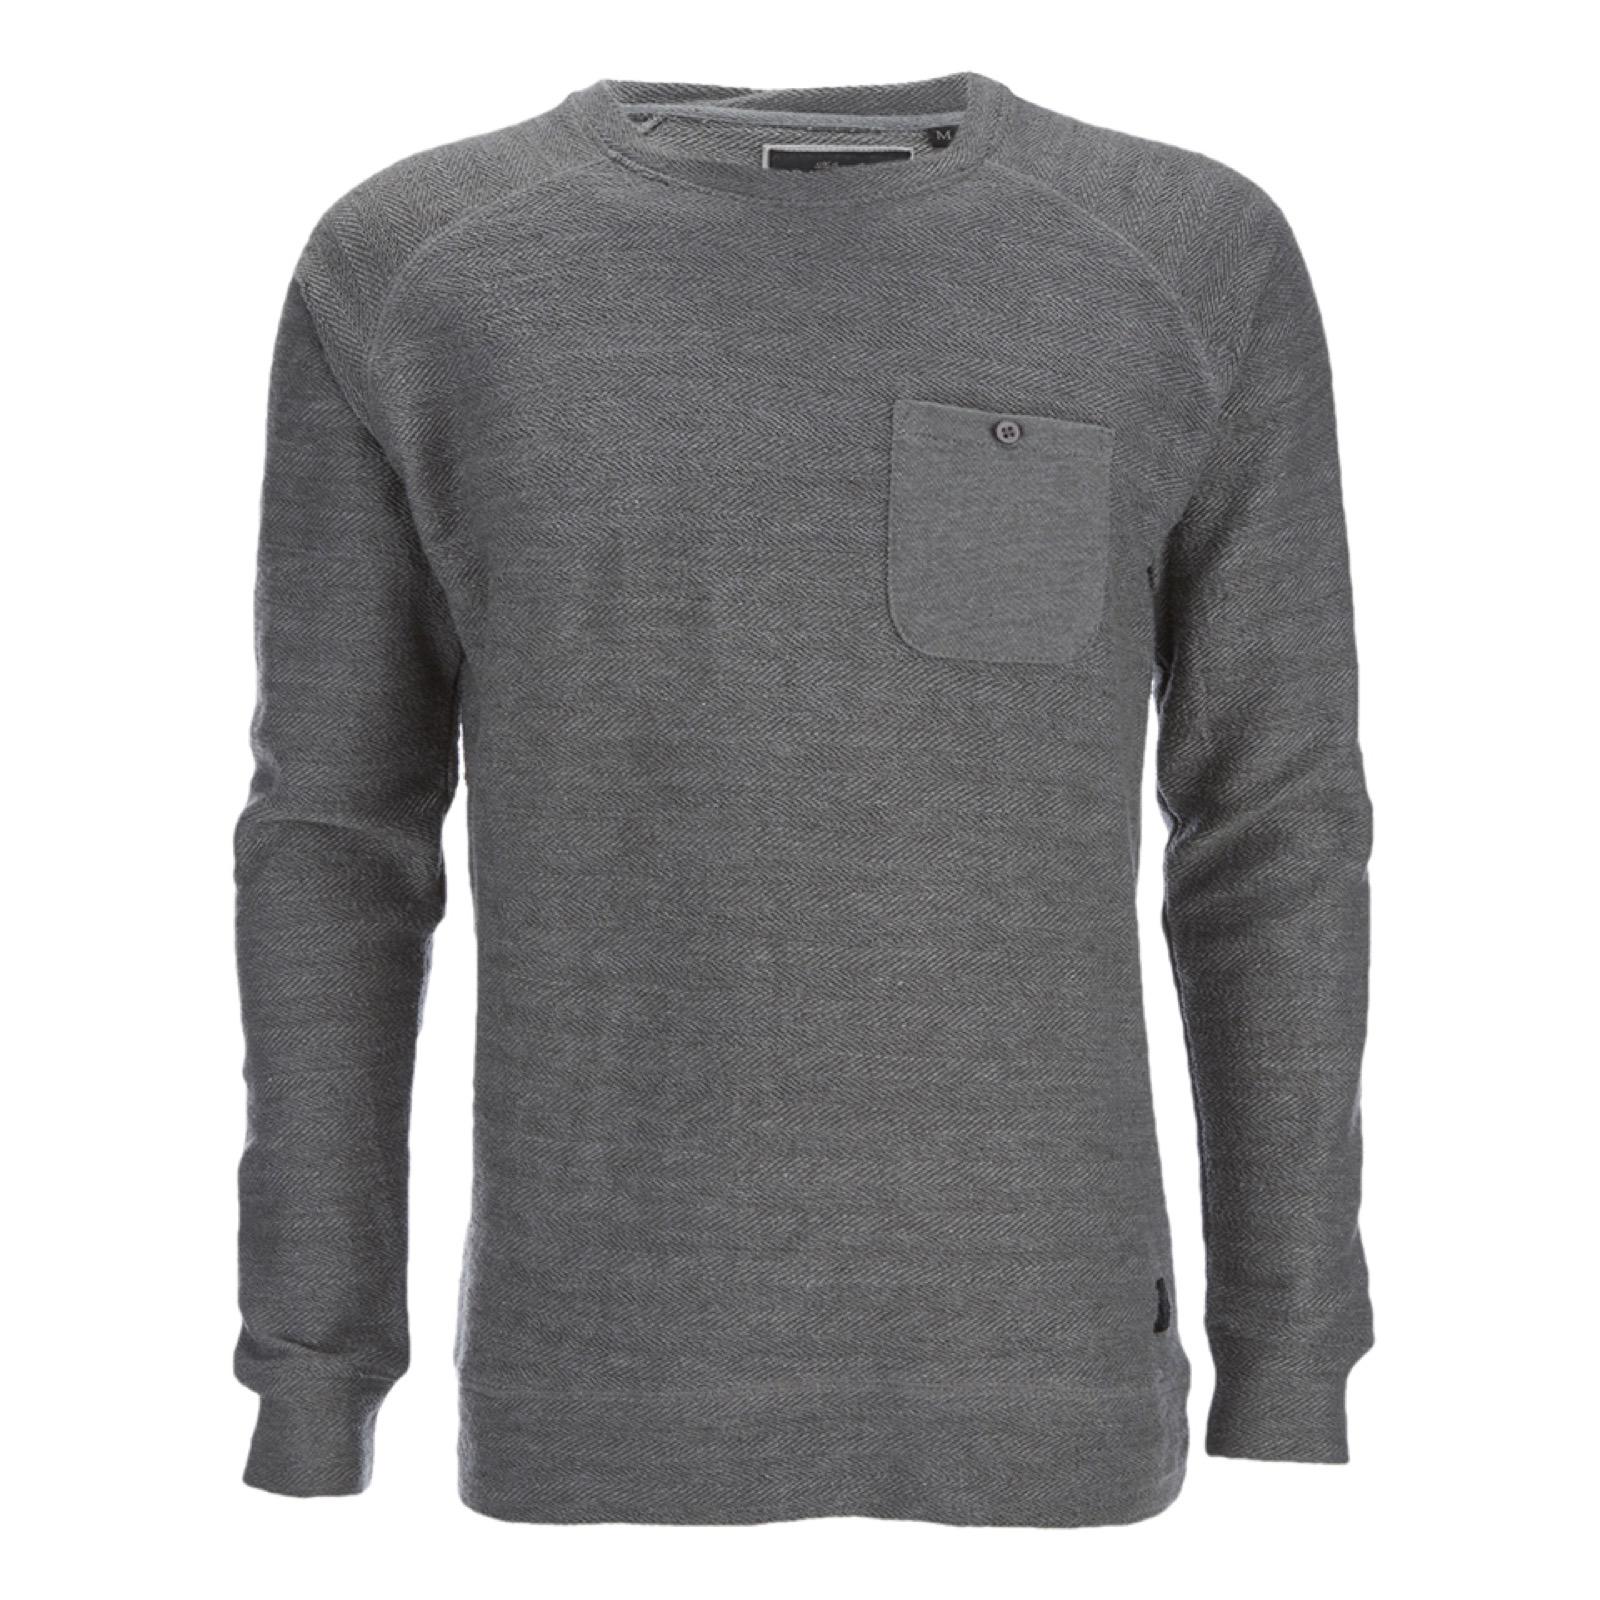 e81e3fec0b0955 Brave Soul Men's Adler Textured Pocket Jumper - Mid Grey | IWOOT